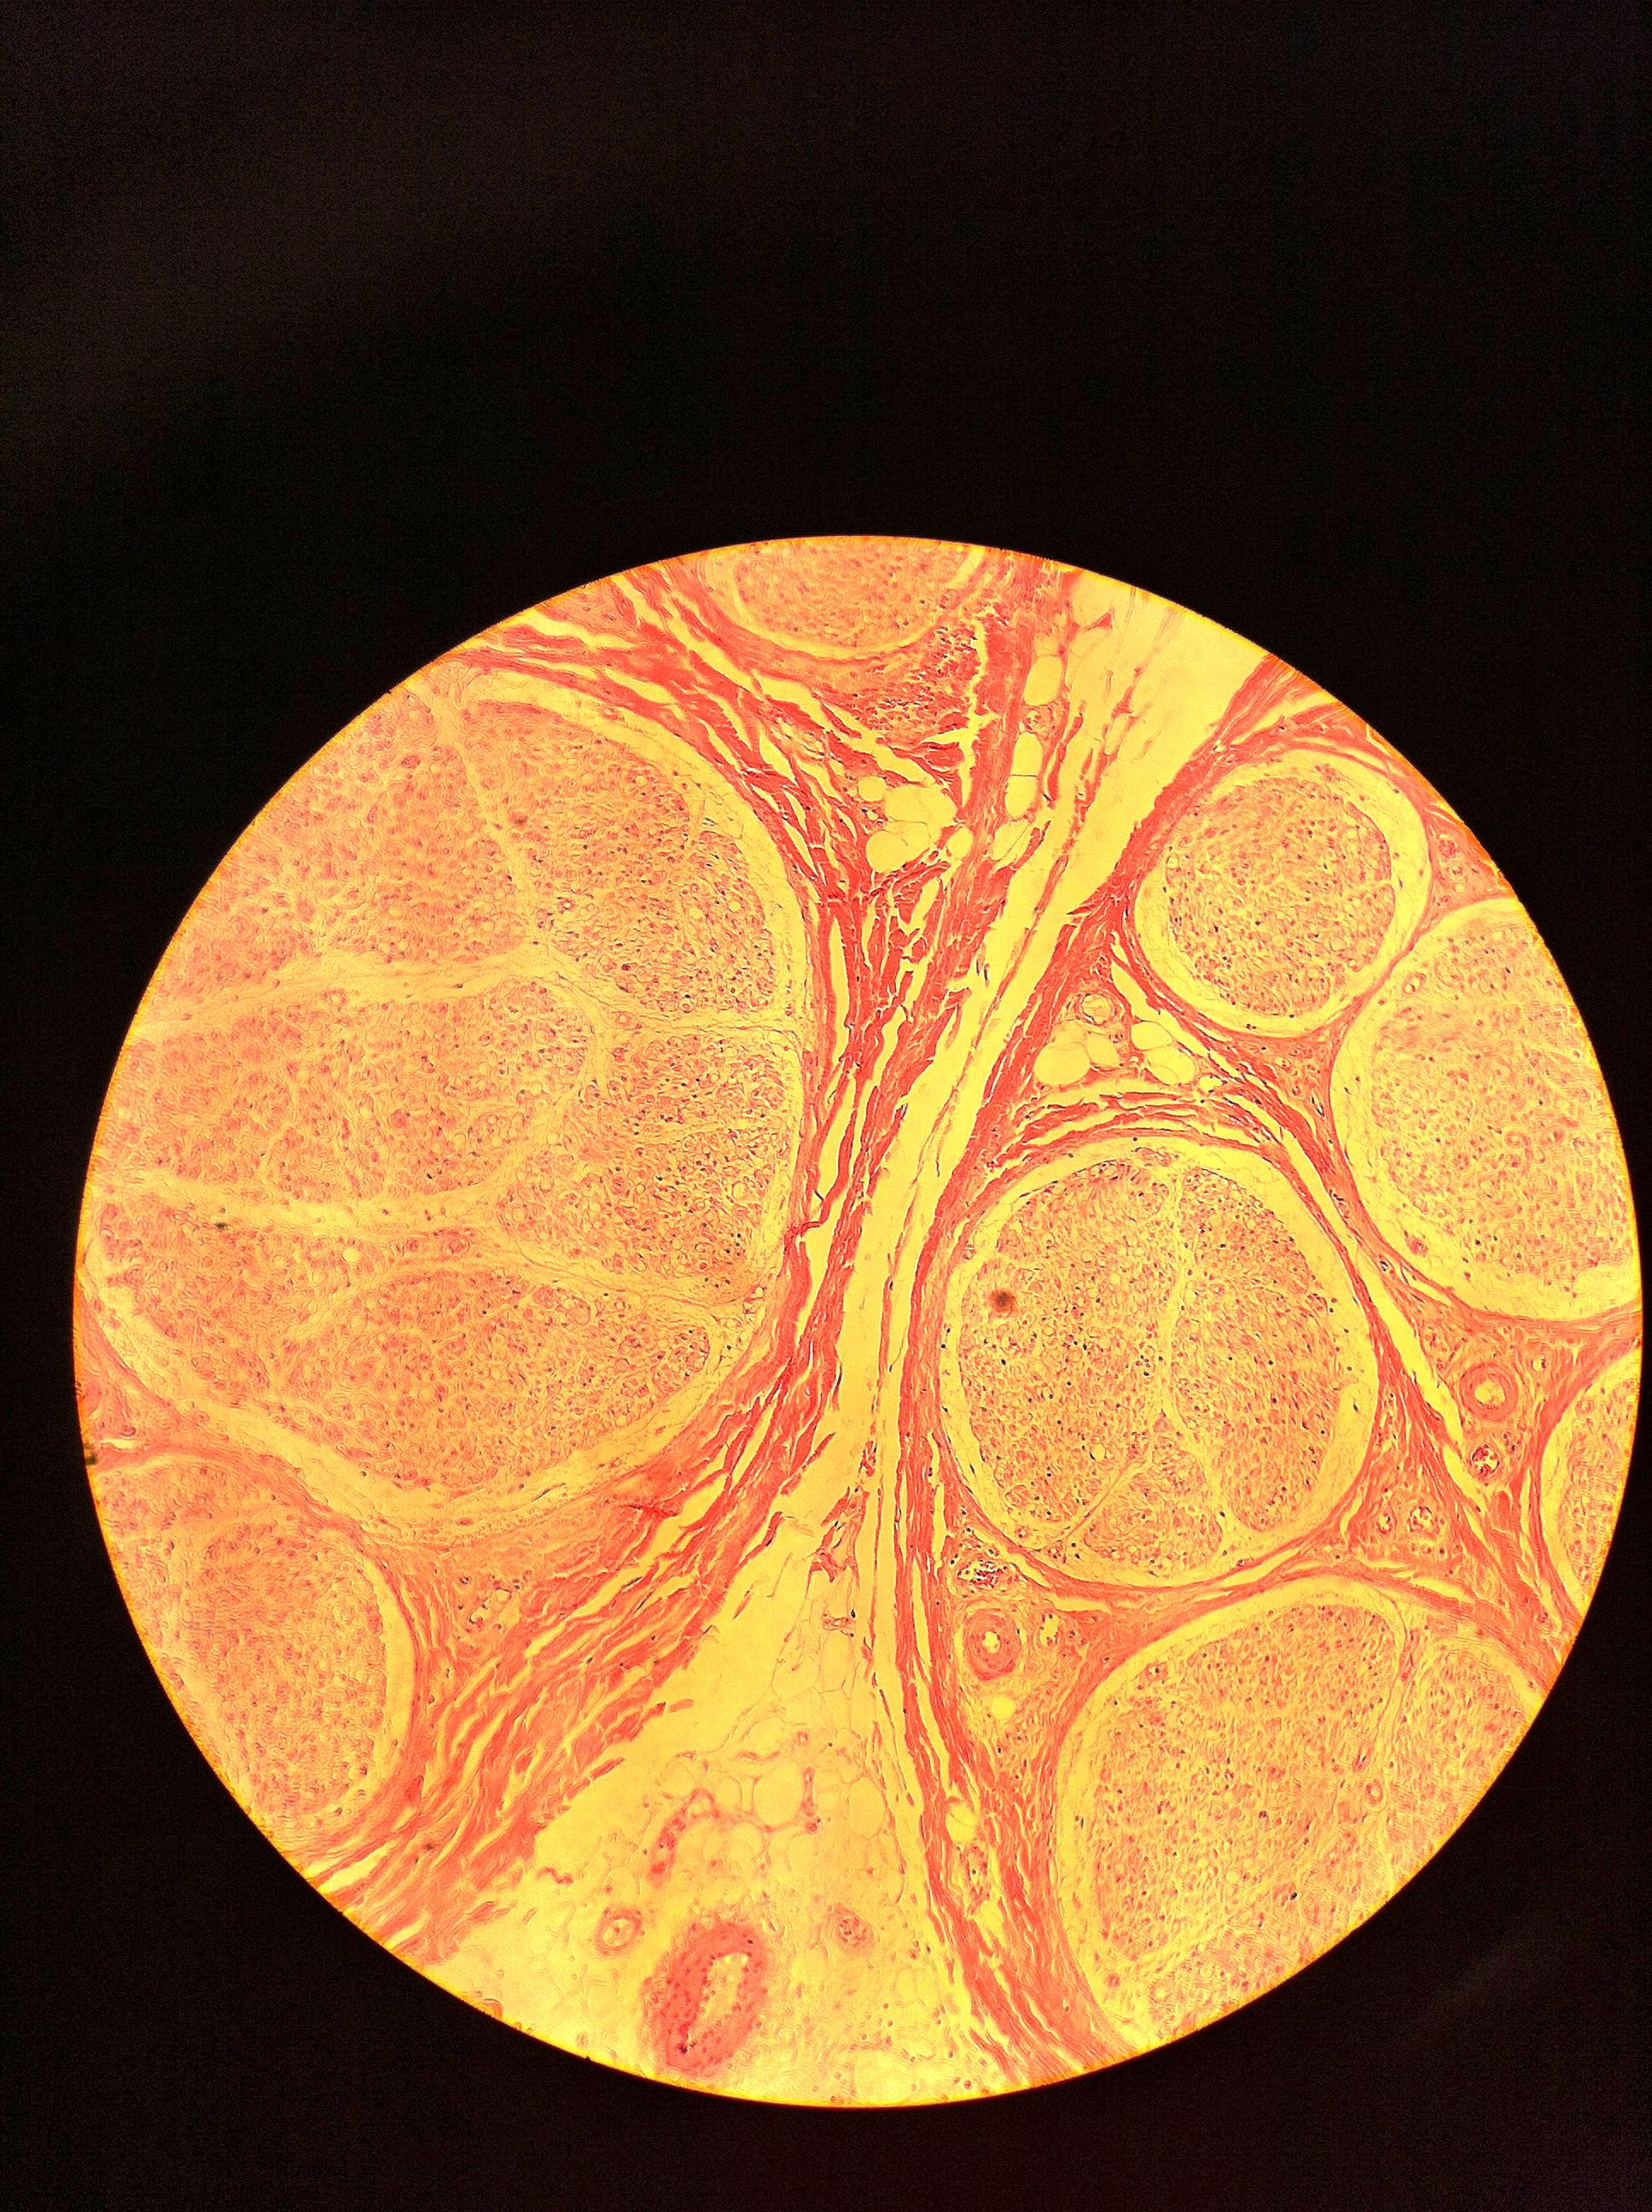 Neuron (cs) 100X